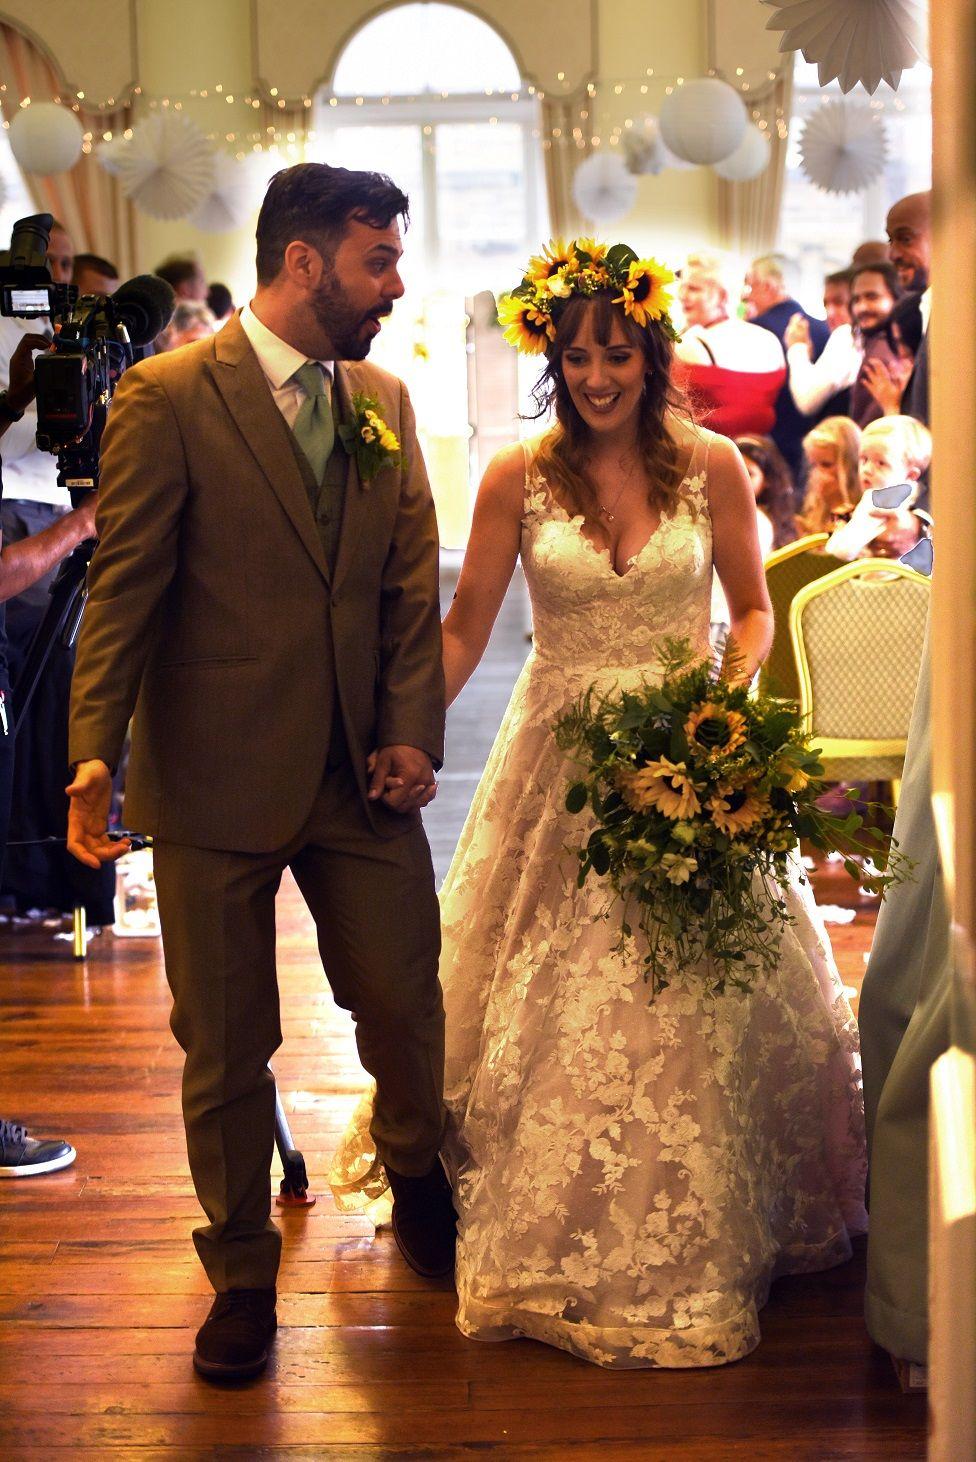 Kayley and Joe at their wedding